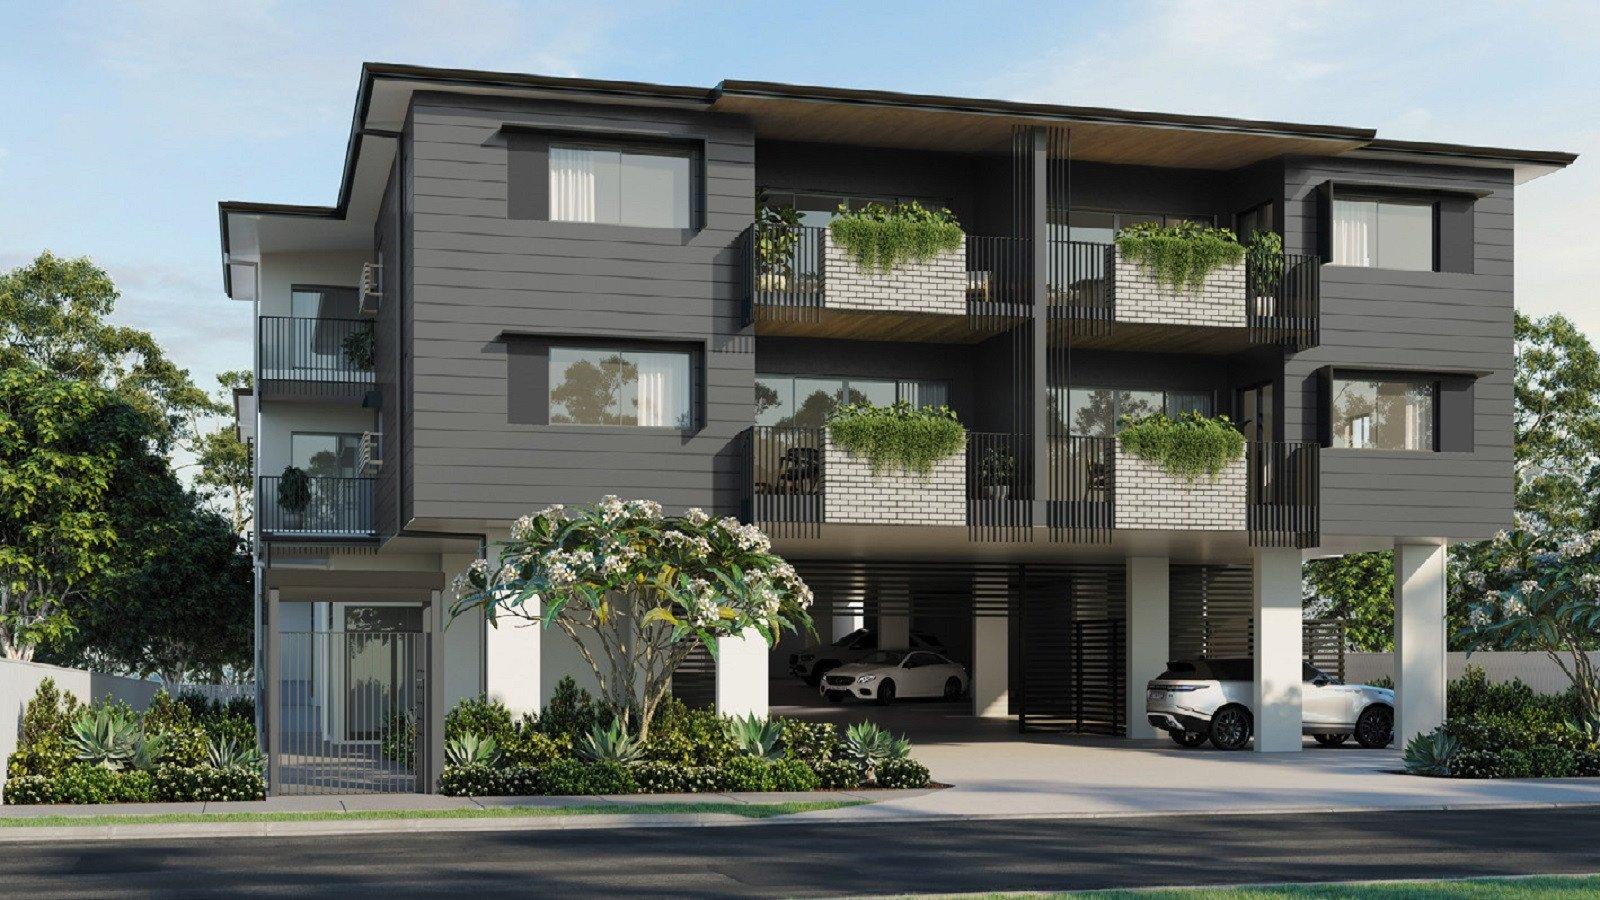 Acordia Residences-image-1